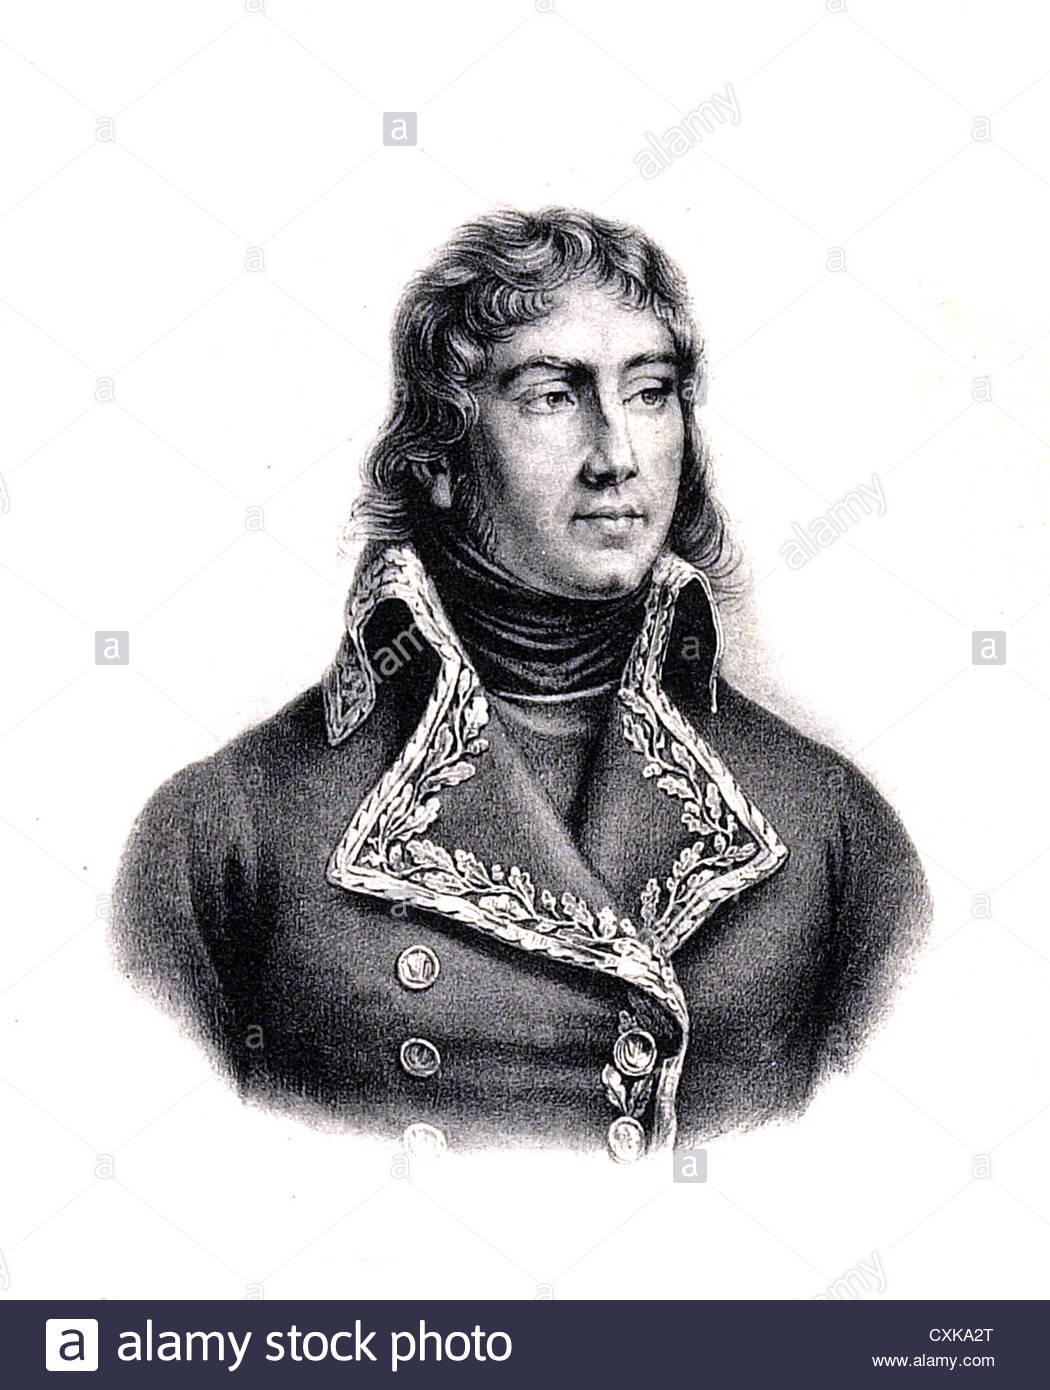 Louis Charles Antoine Desaix de Veygoux 1768 - 1800